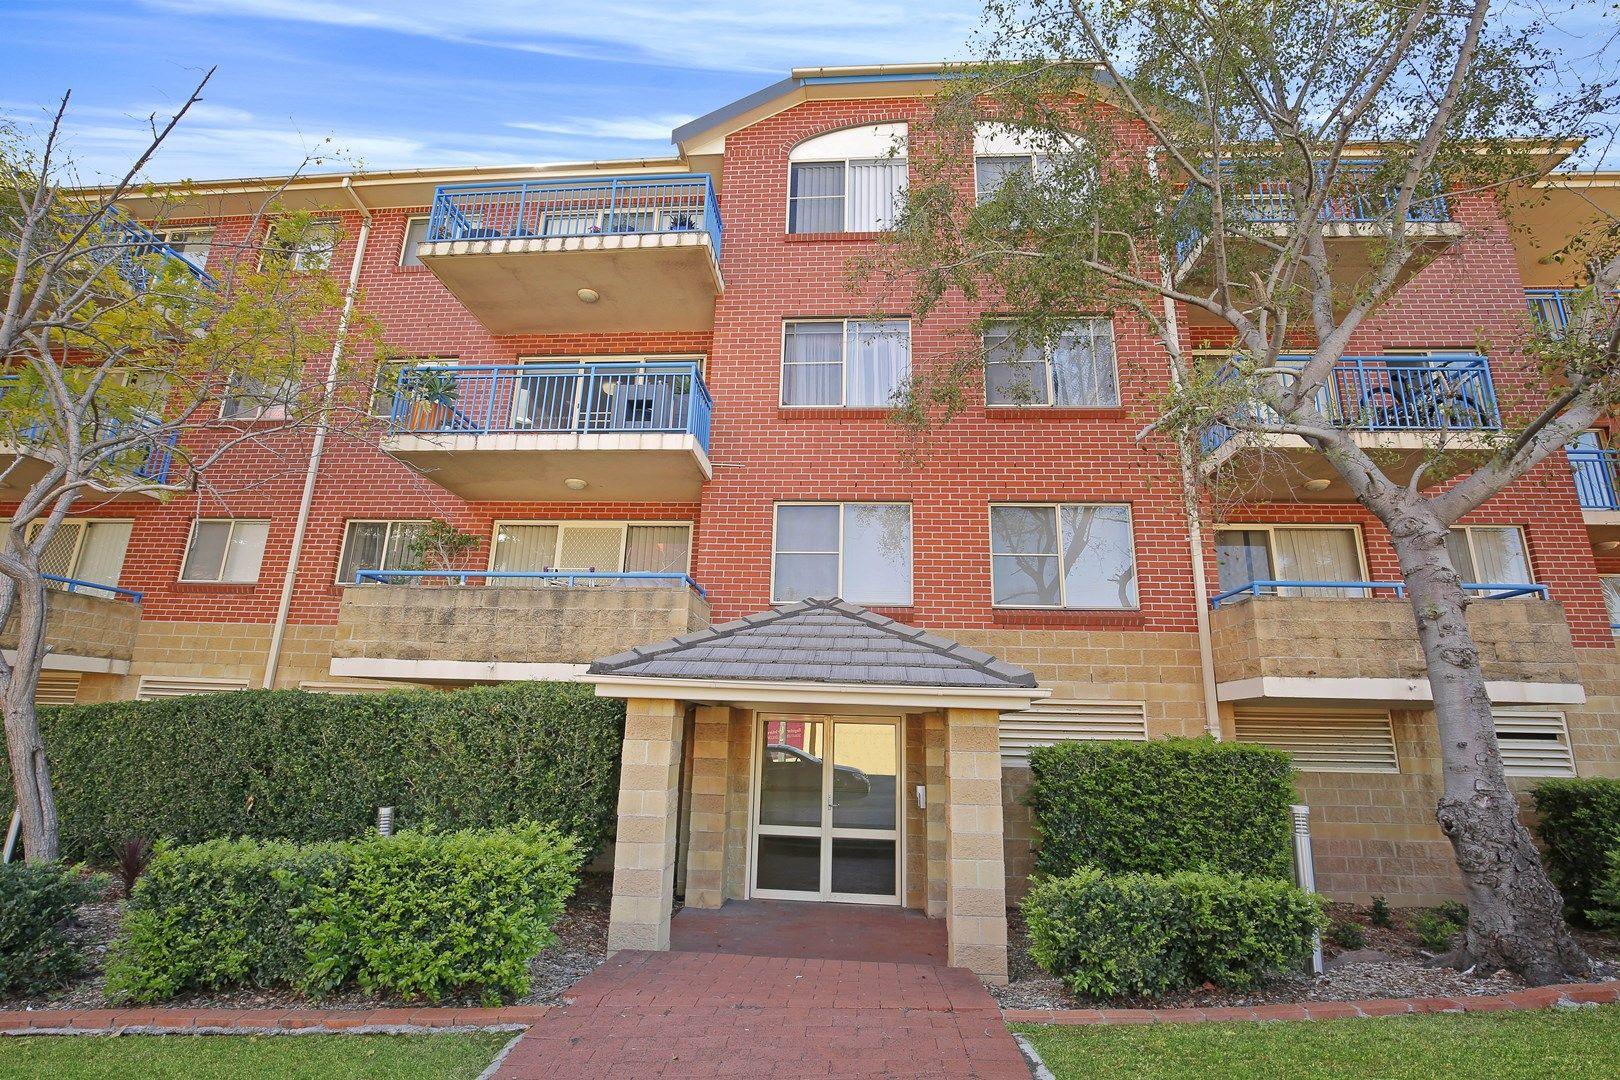 17/7 Regent Street, Wollongong NSW 2500, Image 0